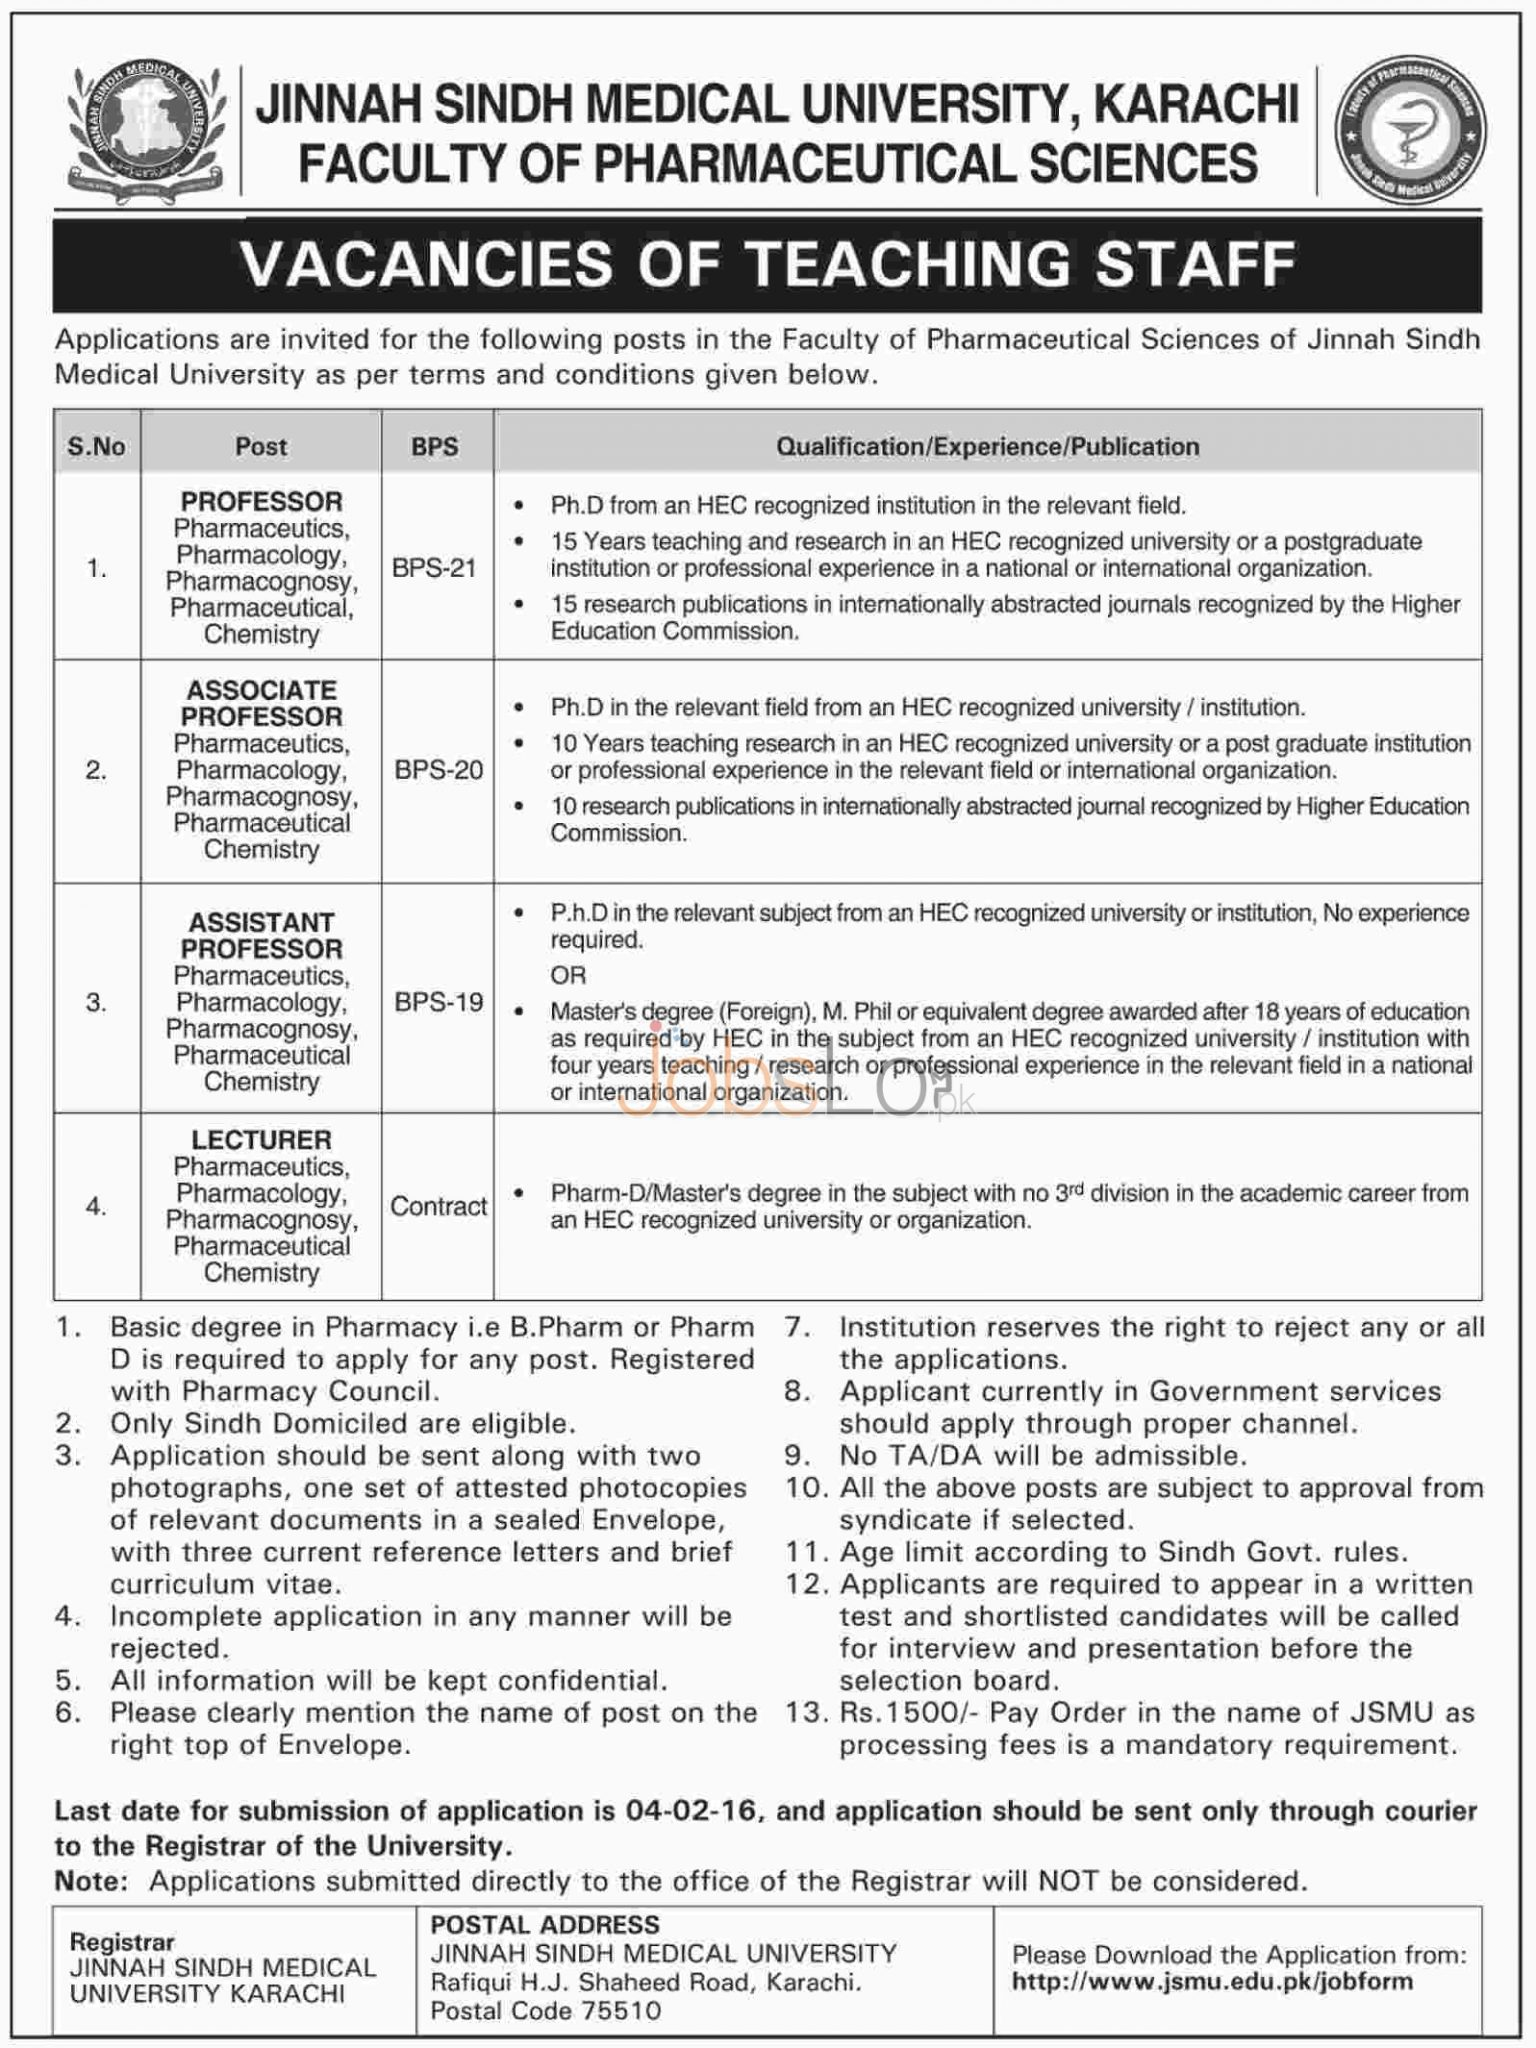 Jobs in Jinnah Sindh Medical University 2016 Karachi